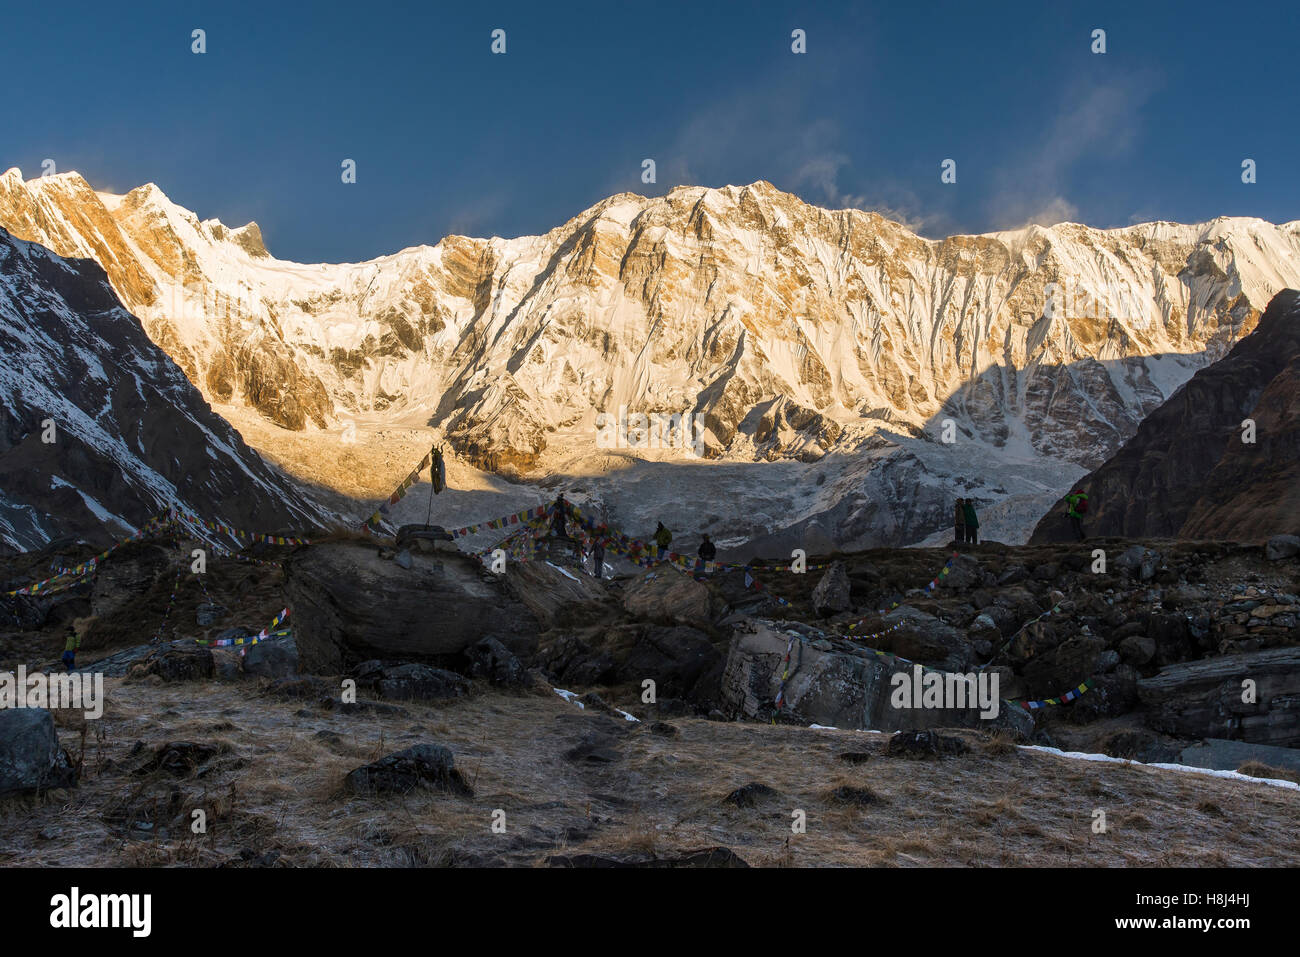 Annapurna at sunrise from Annapurna Base Camp - Stock Image